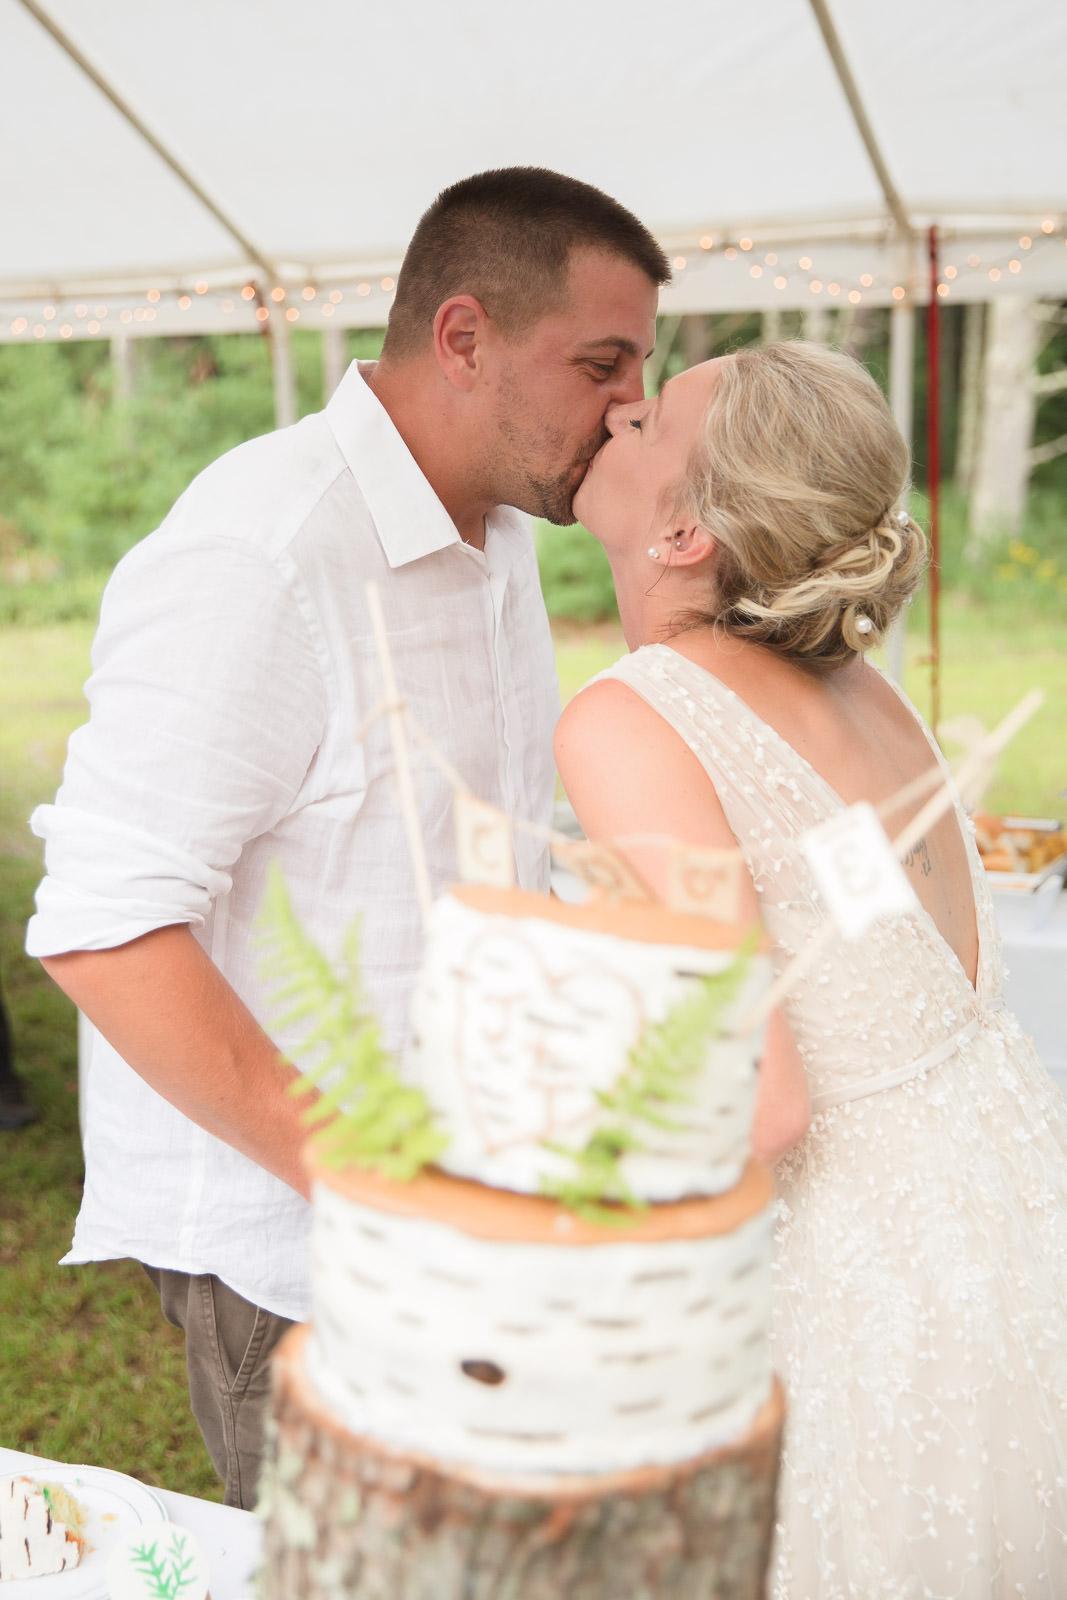 Coventry, Rhode Island, RI, Backyard Wedding, forest, earthy, wedding, tracy jenkins photography, wedding photographer, ri wedding photographer, Rhode Island Wedding photographer, cake cutting